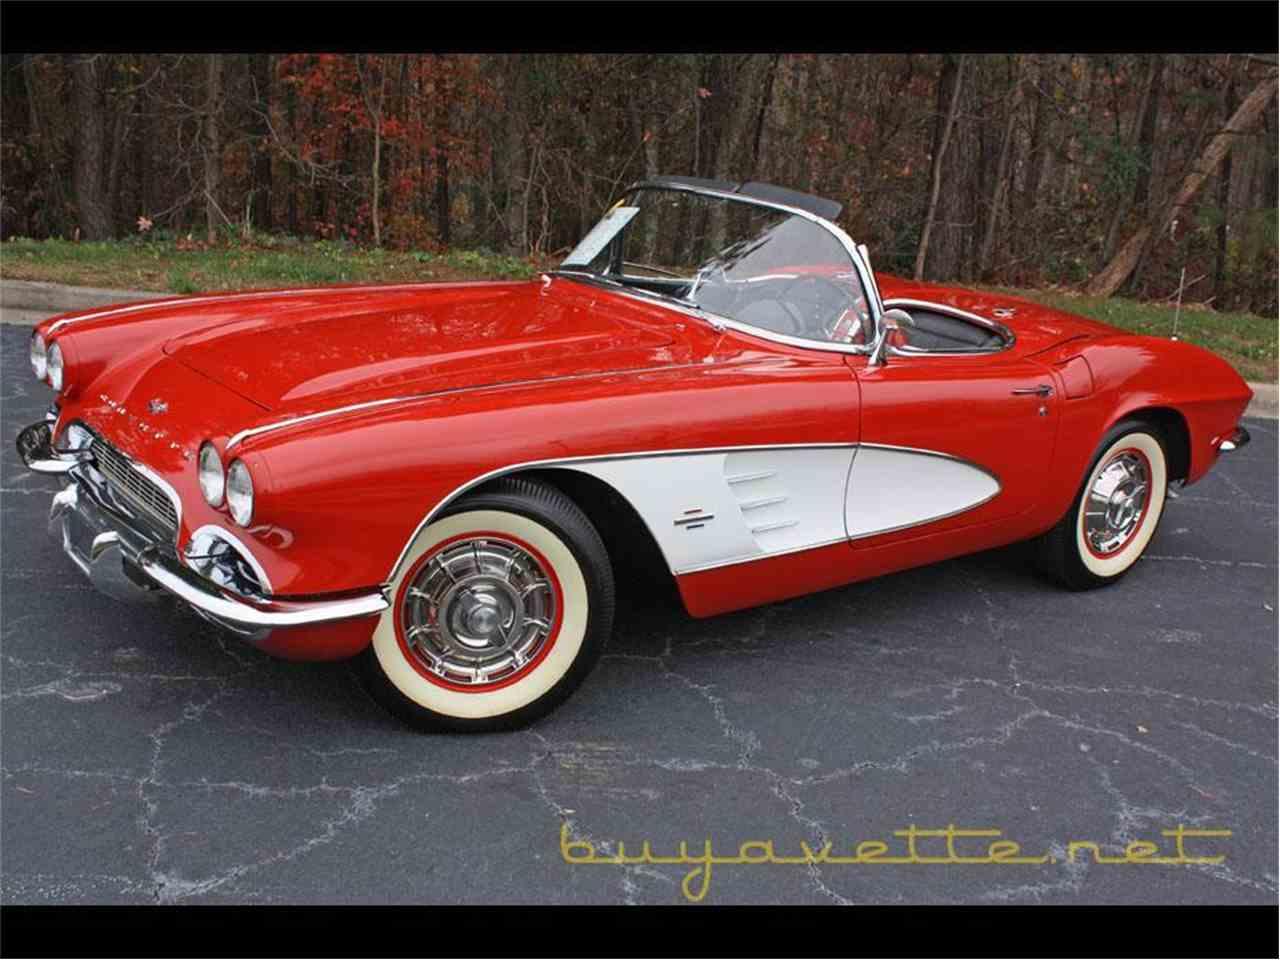 Large Picture of 1961 Chevrolet Corvette located in Atlanta Georgia - $74,999.00 - FSDF